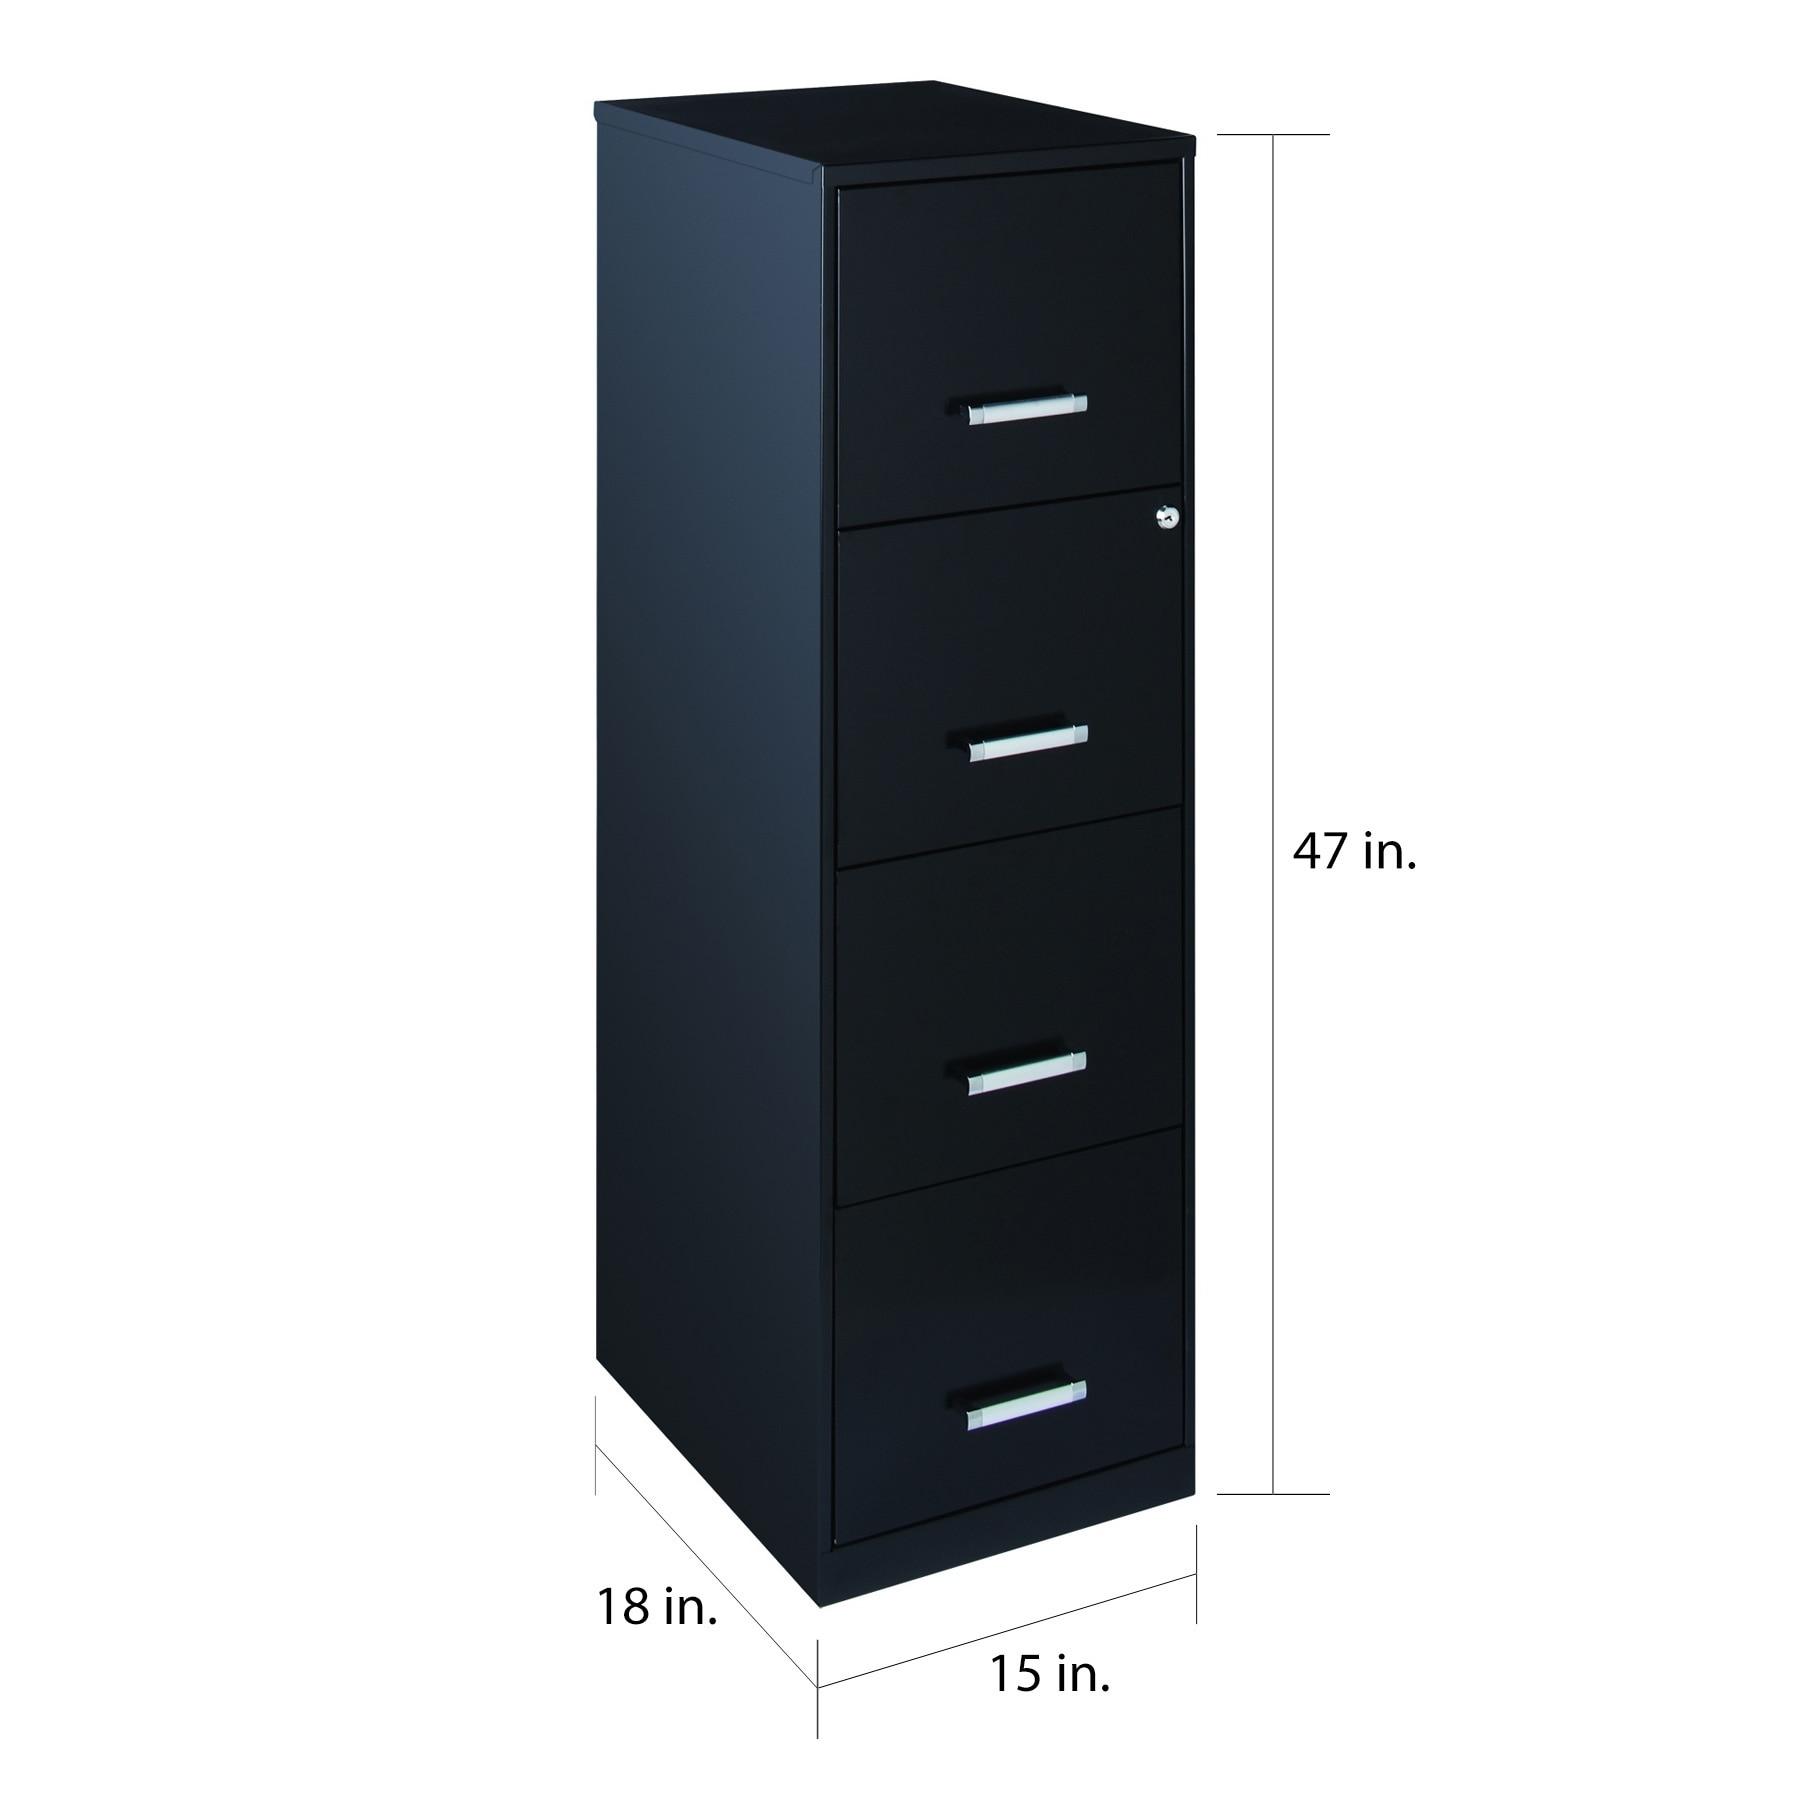 18 4 Drawer Metal File Cabinet Black Free Shipping Today 18252621